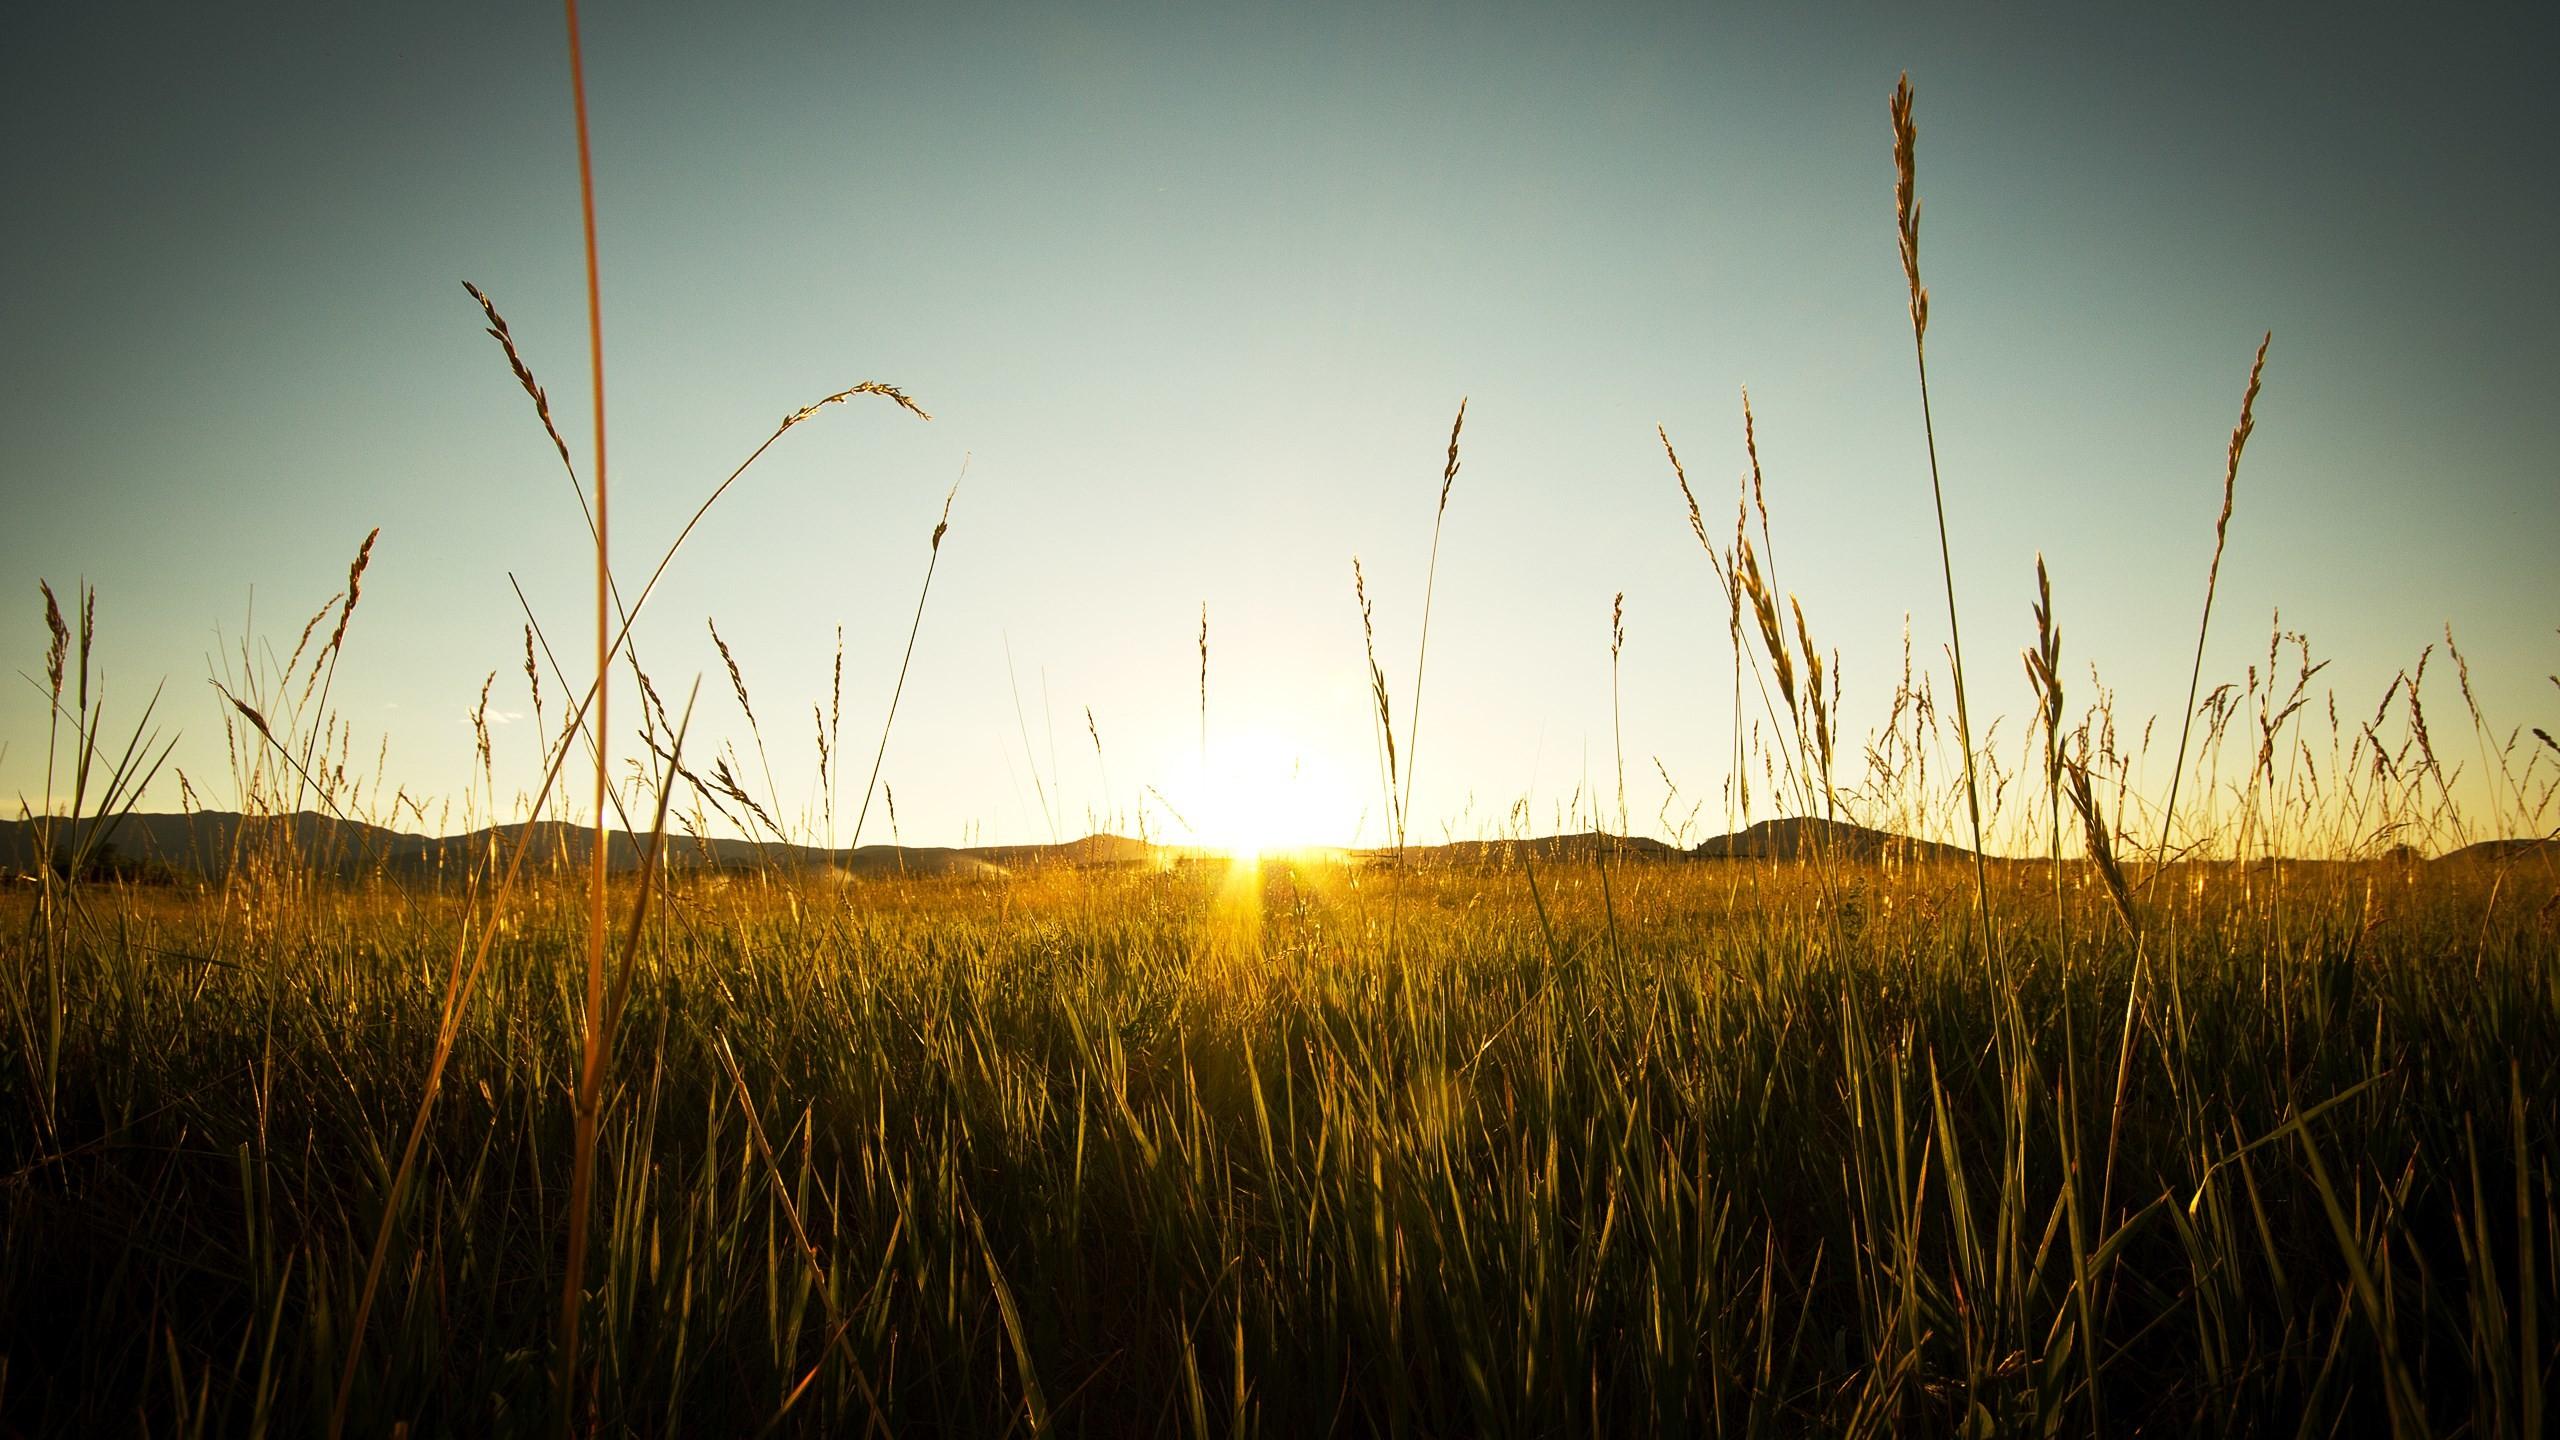 px HD Widescreen Wallpapers – sunbeam backround by Langham Thomas  for : pocketfullofgrace.com